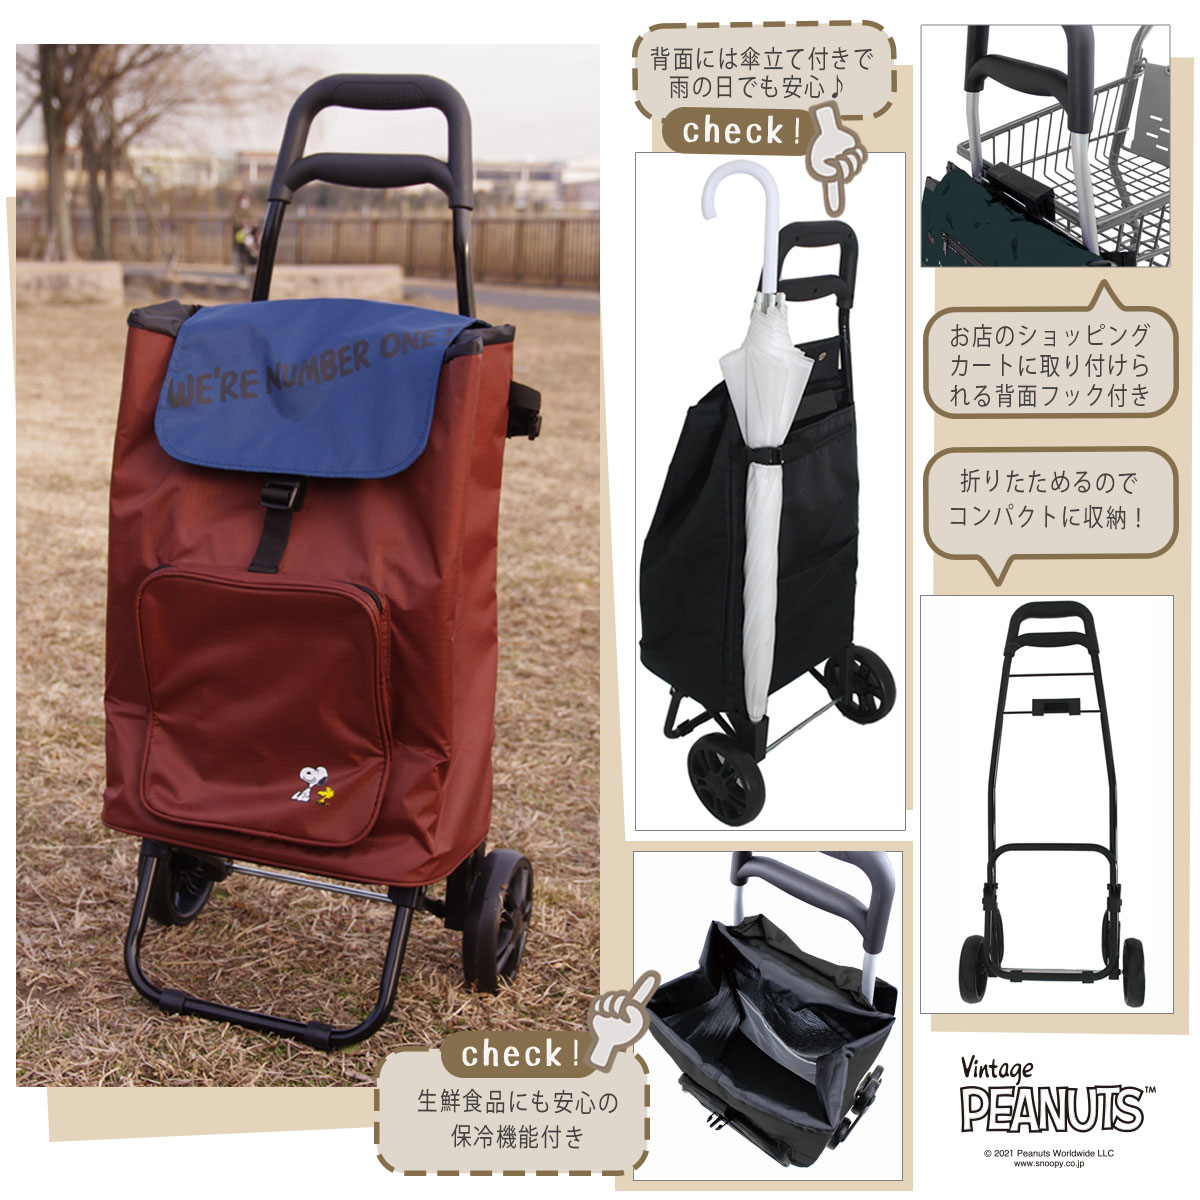 img_shoppingcart_05